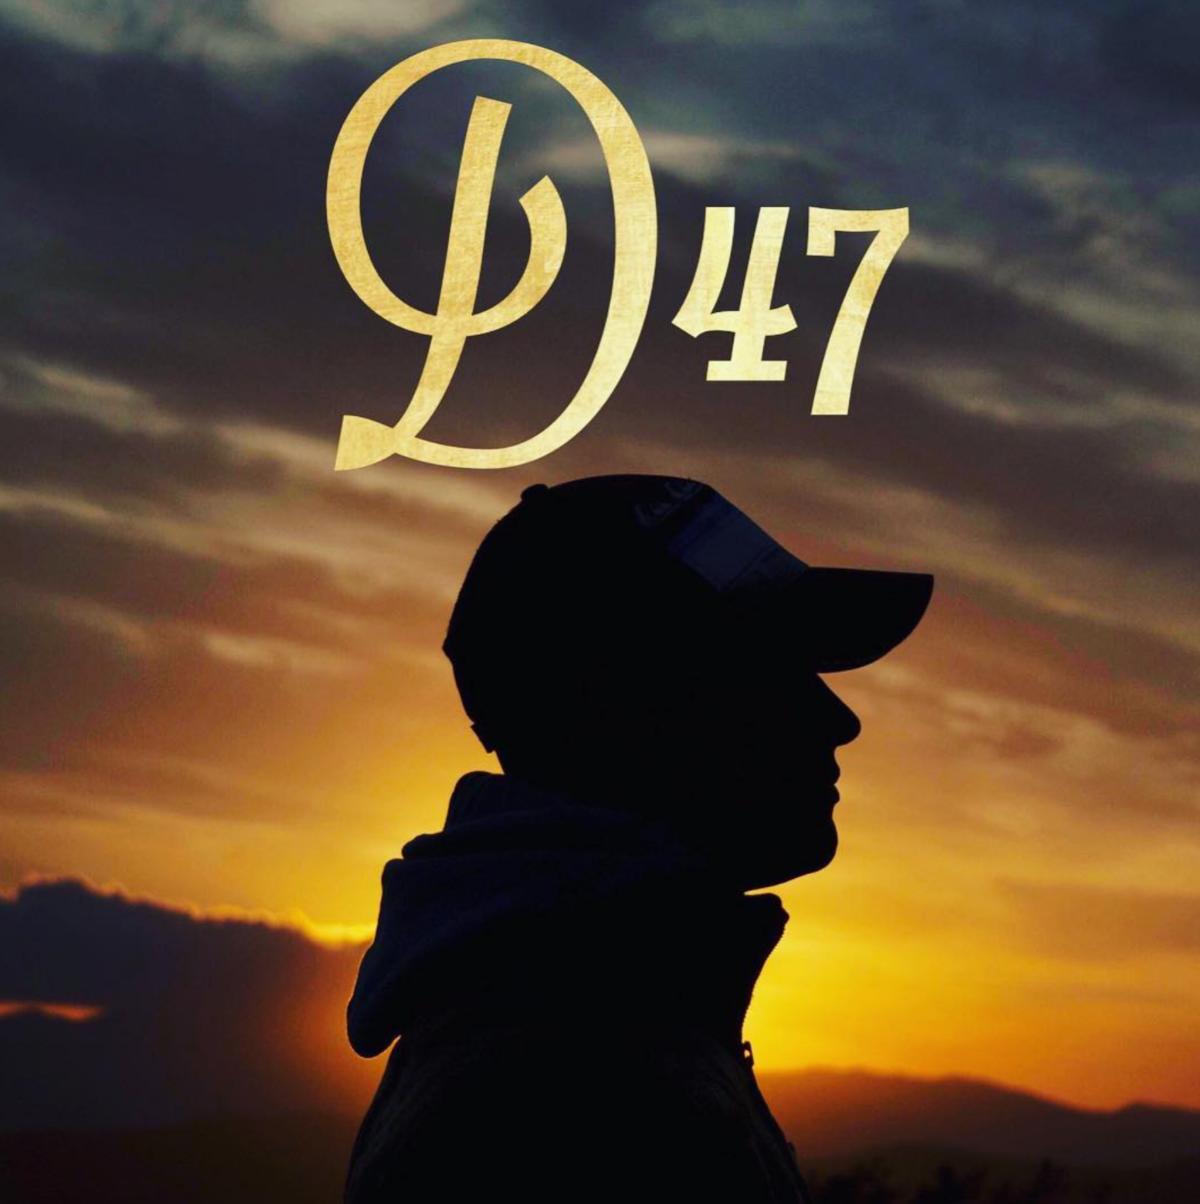 D47 (Credit Master-Records)